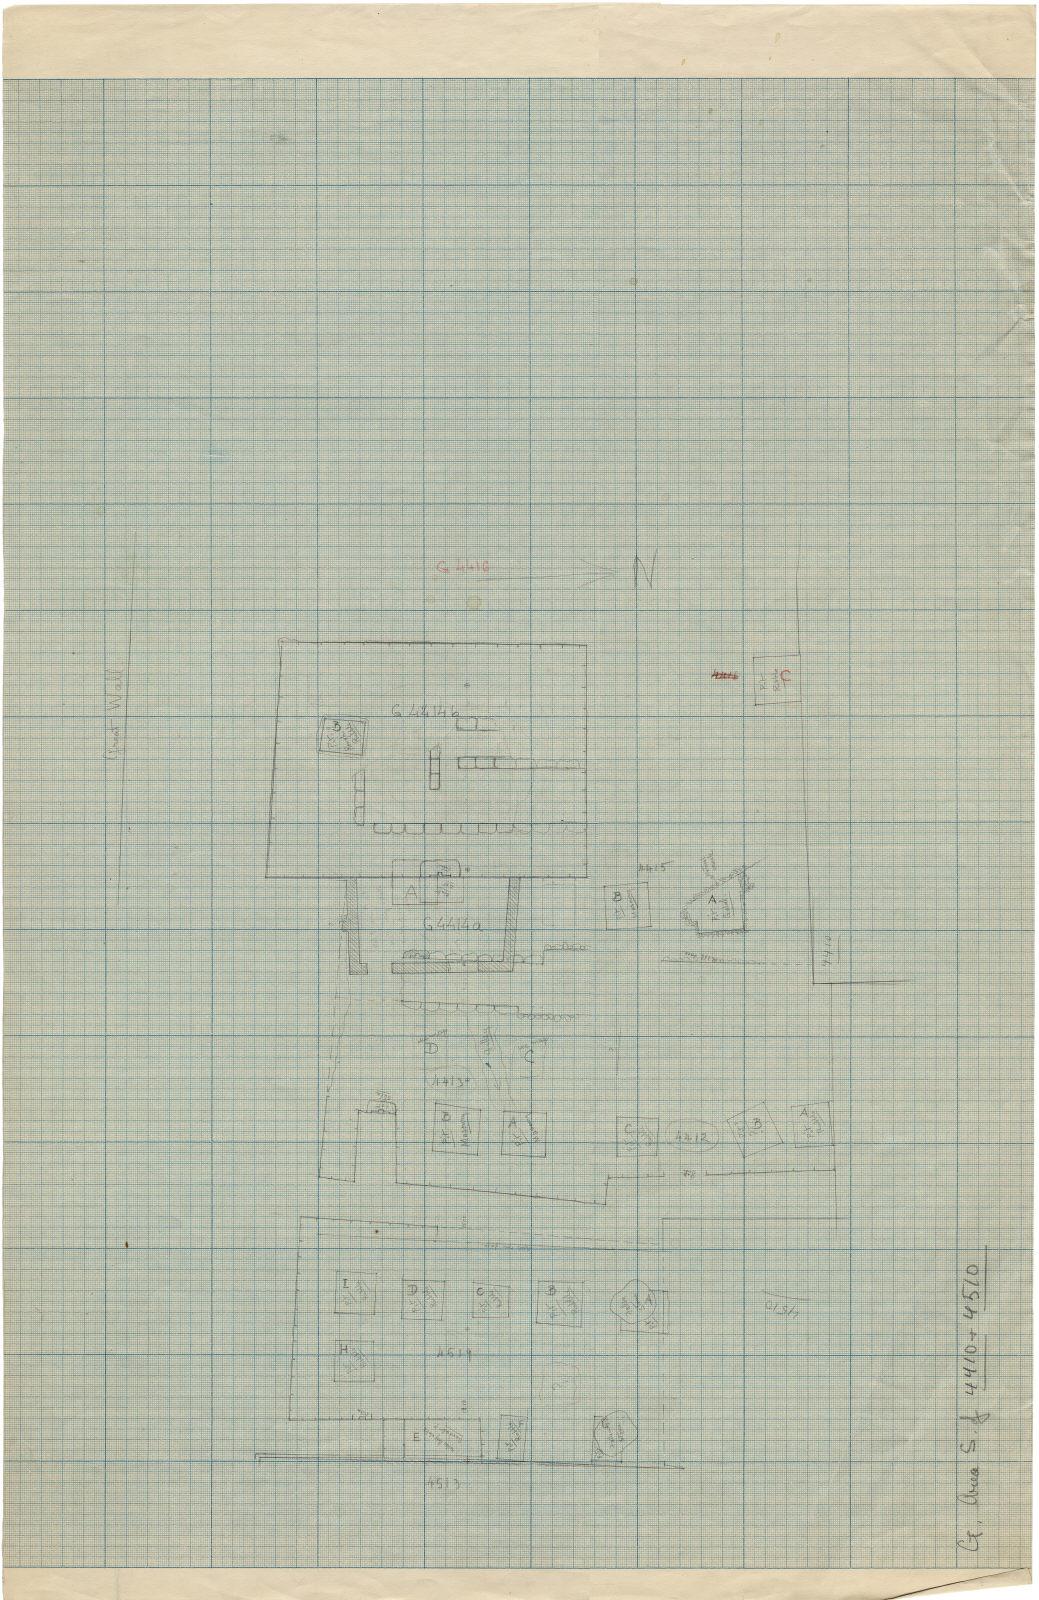 Maps and plans: Plan of G 4410, G 4412, G 4413, G 4414, G 4415, G 4416, G 4510, G 4513, G 4519